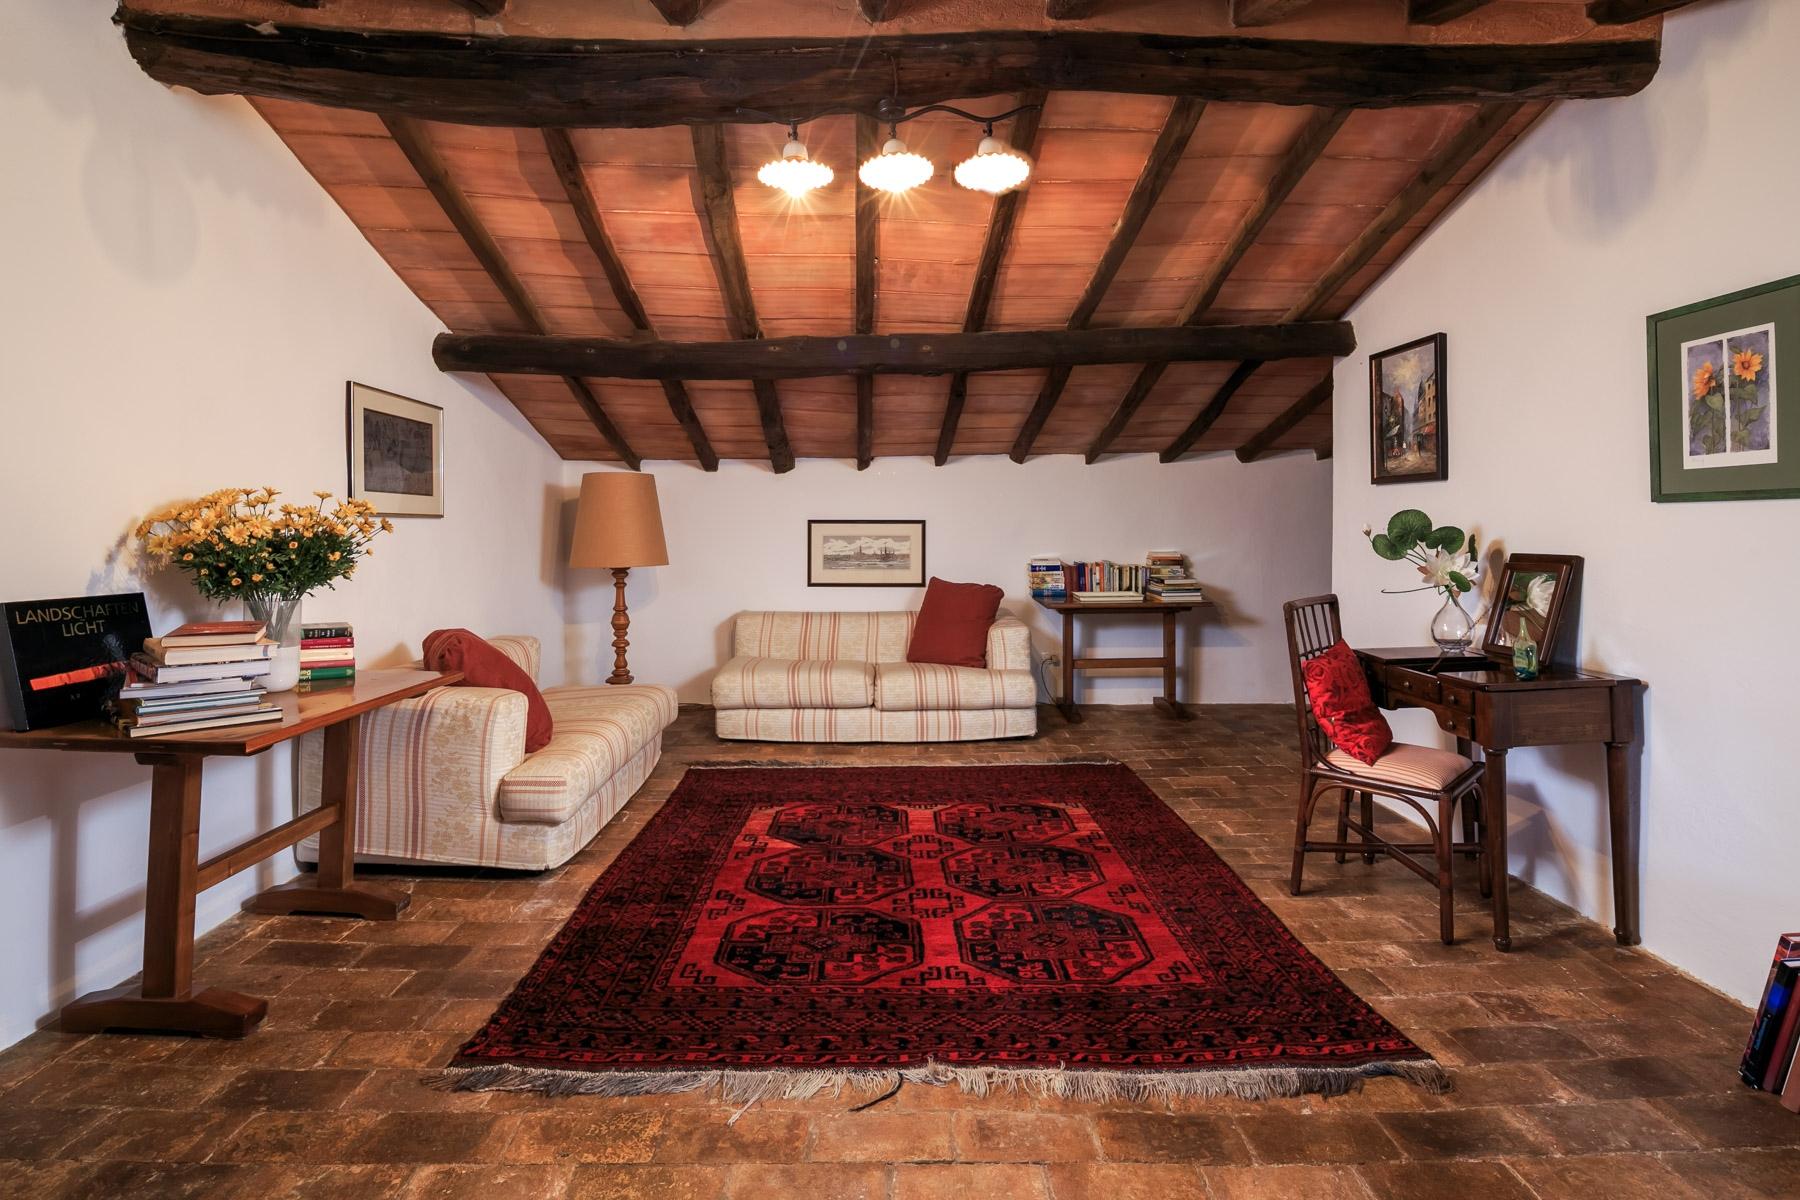 Villa in Vendita a Campiglia Marittima: 5 locali, 1100 mq - Foto 23